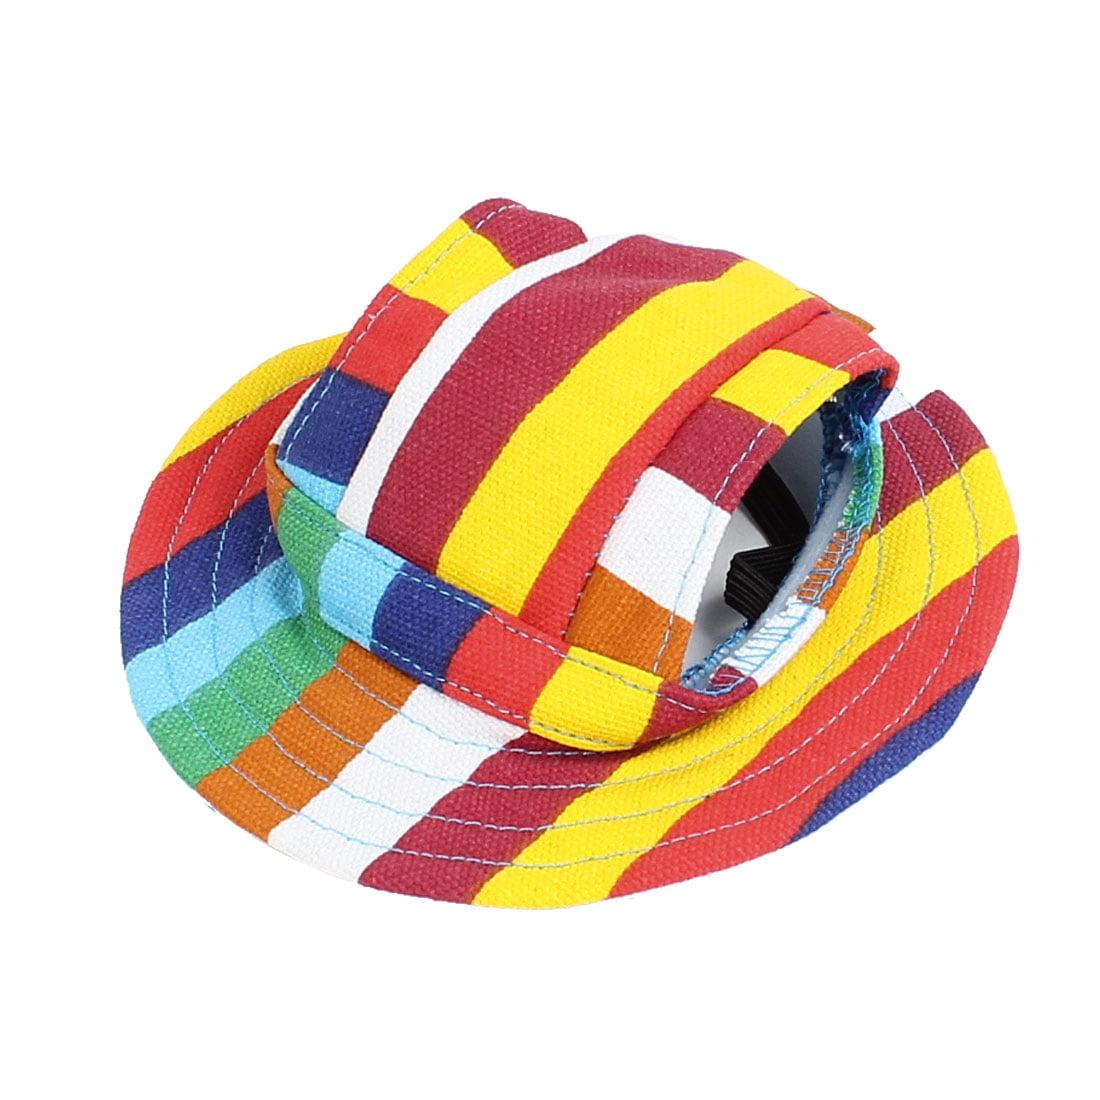 Round Brim Elastic Chin Strap Pet Dog Poodle Fedora Cap Visor Hat ... a0b01872eb9